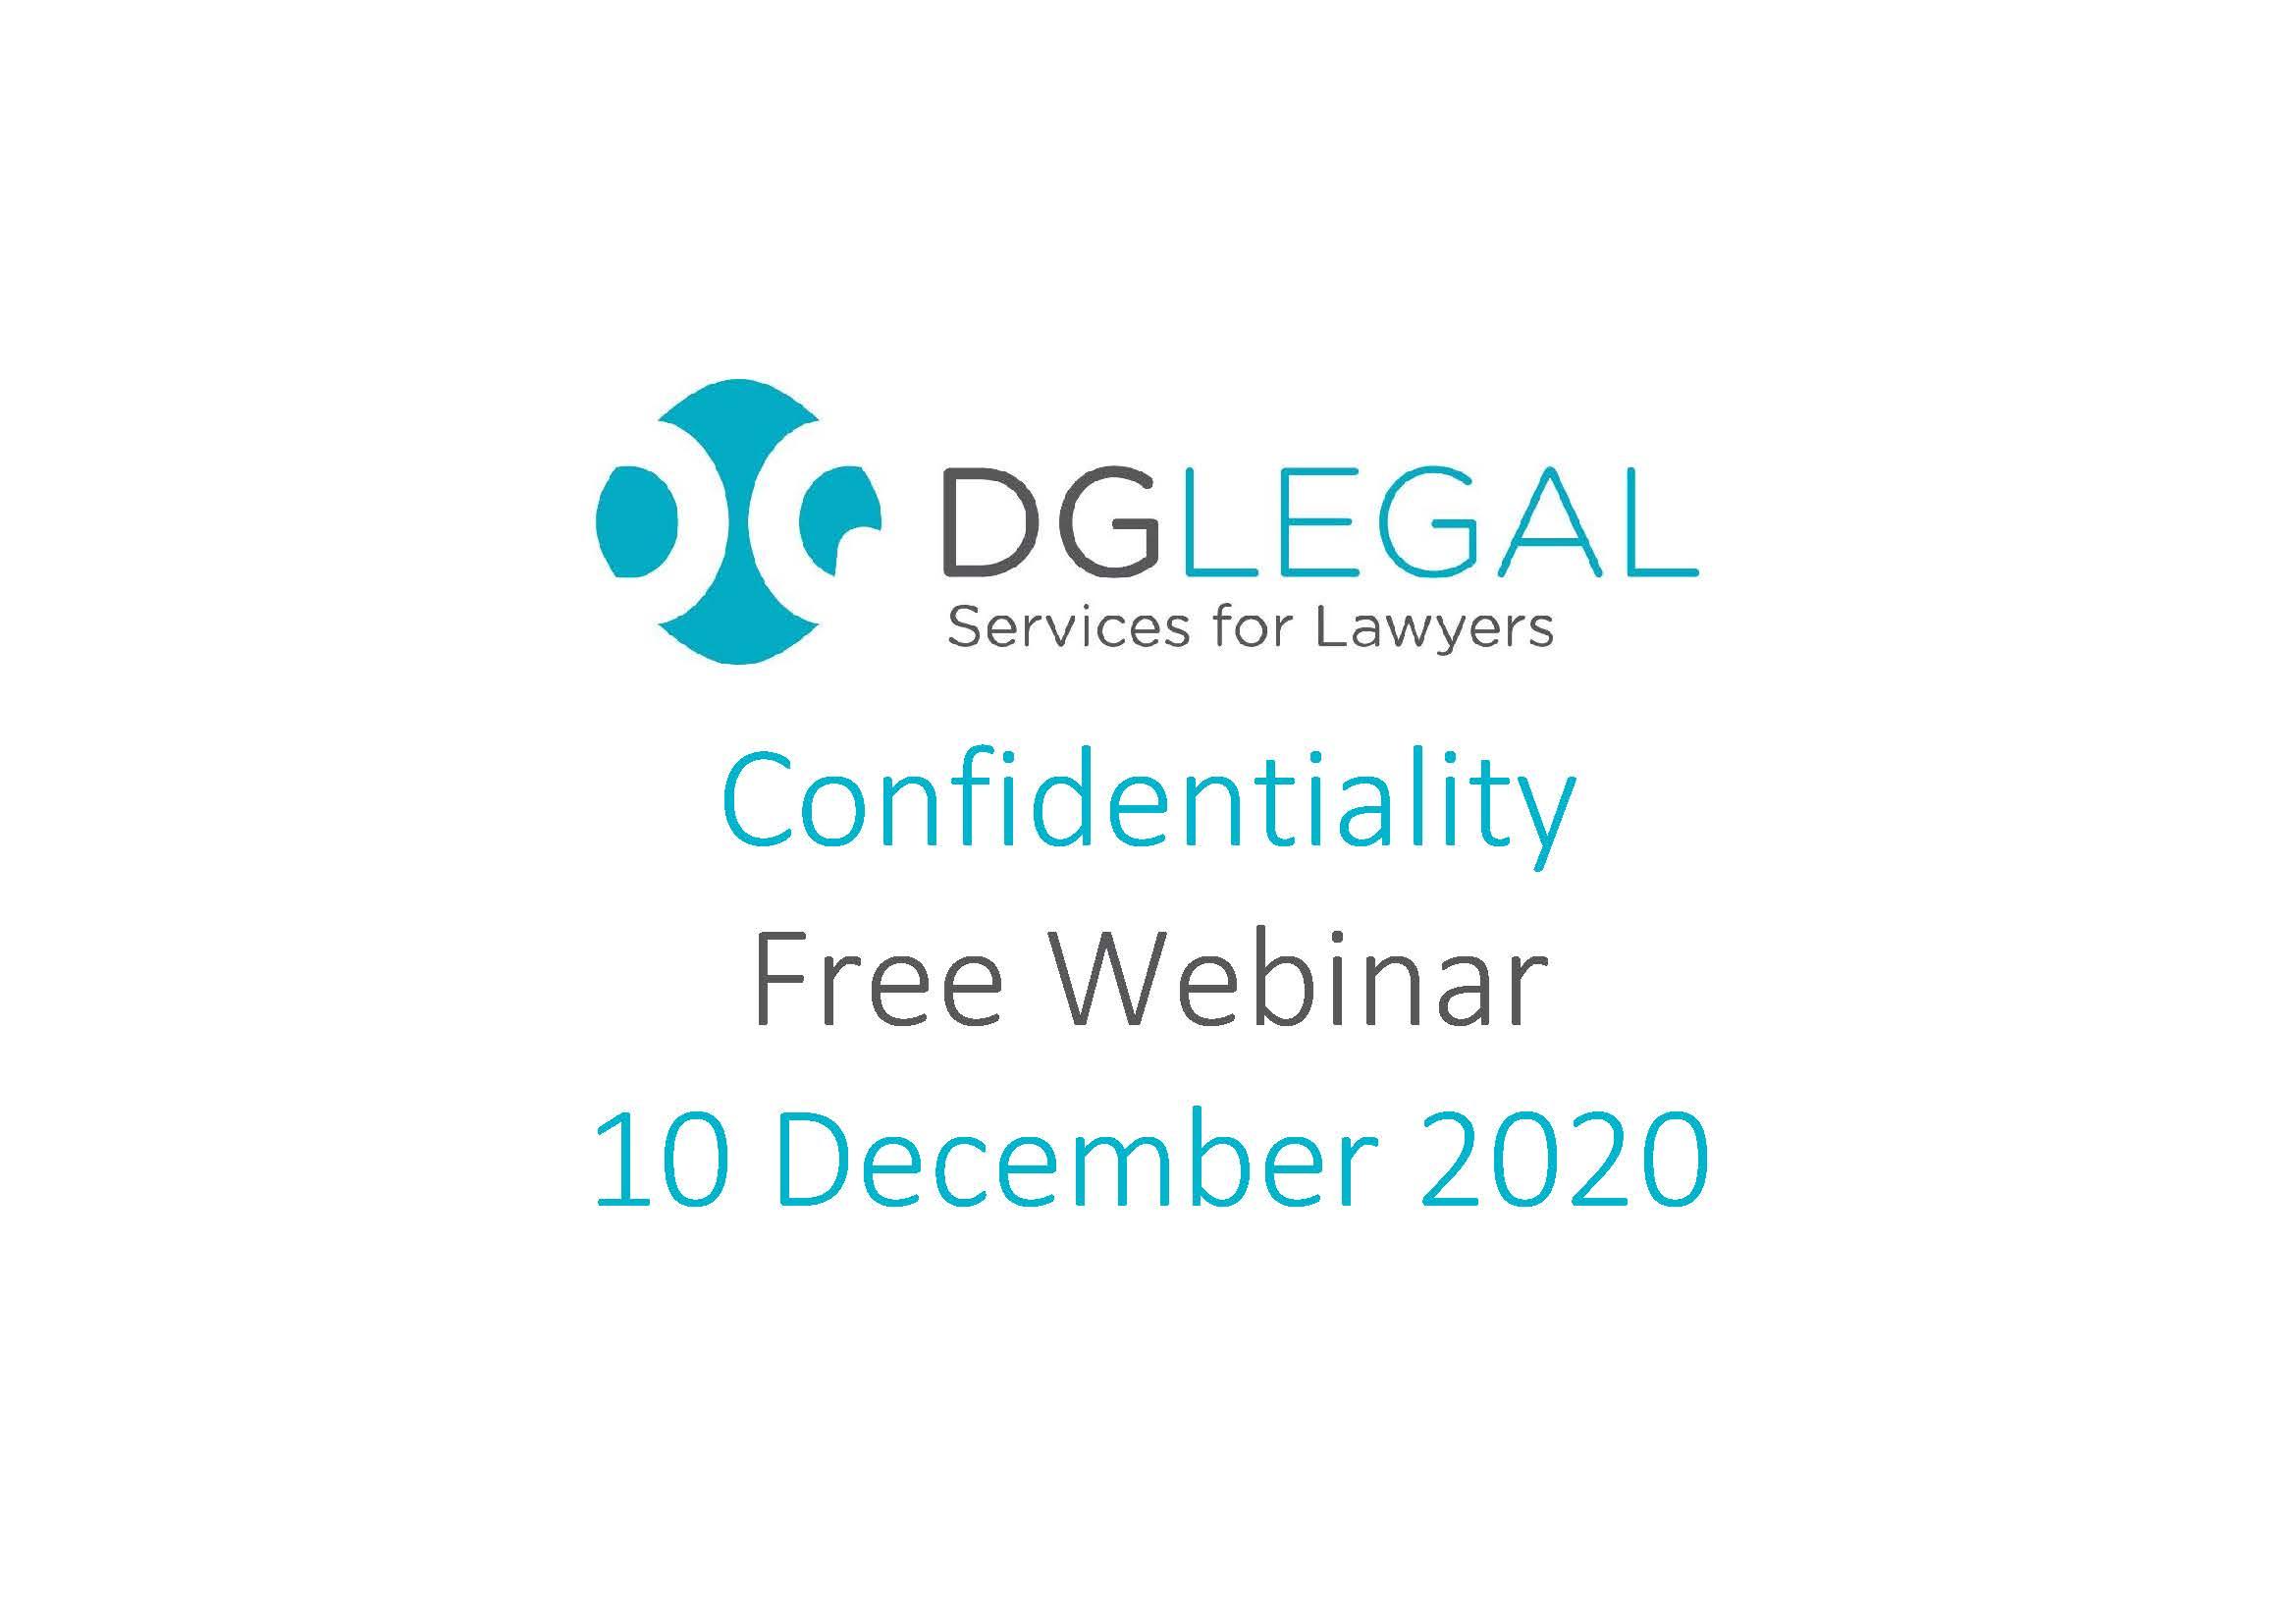 Confidentiality Webinar